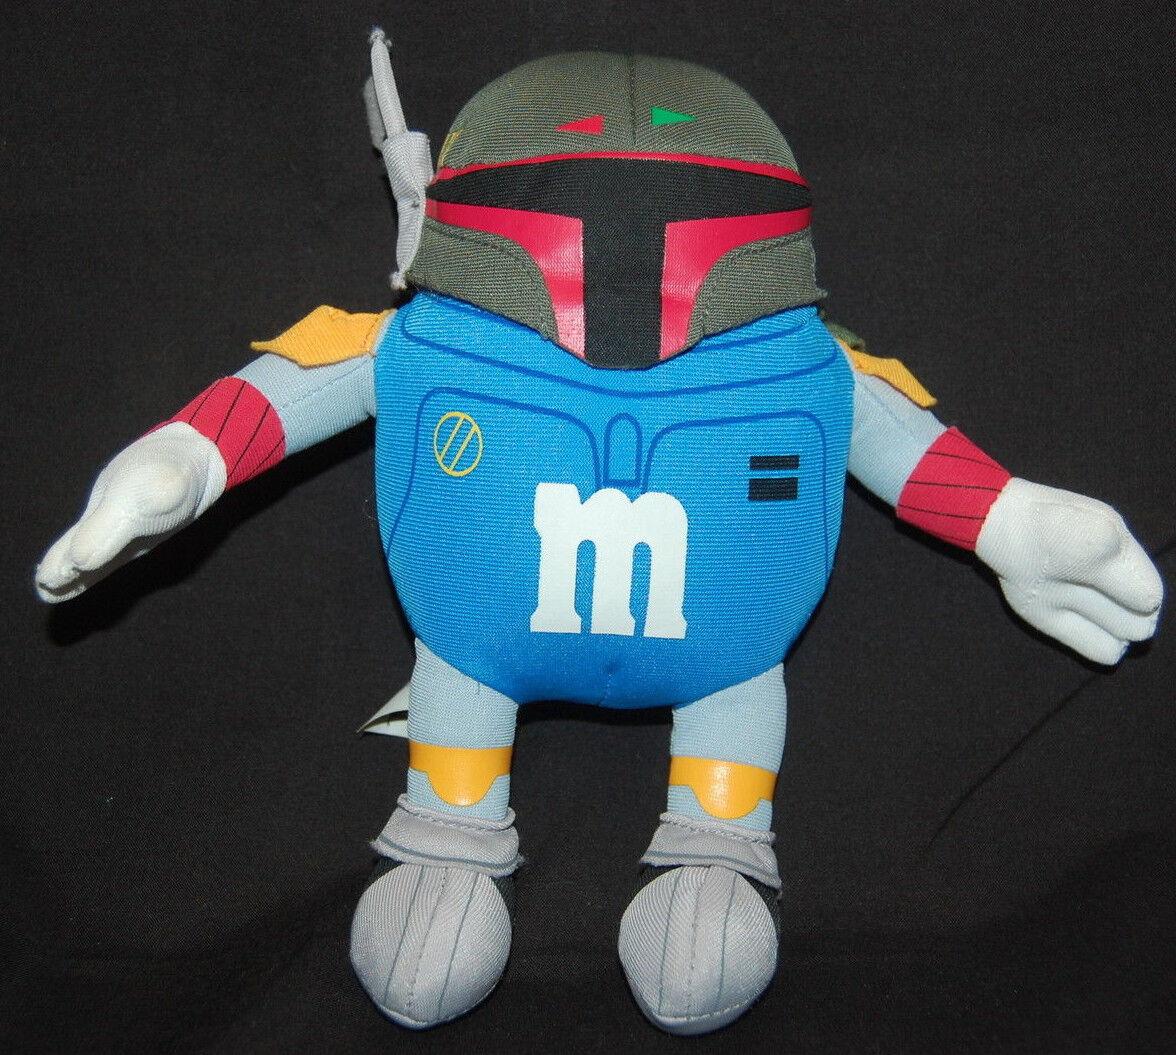 Star Wars Mpire M & M blu Boba Fett Hasbro Chocolate 2005 Plush 7  Toy 85780